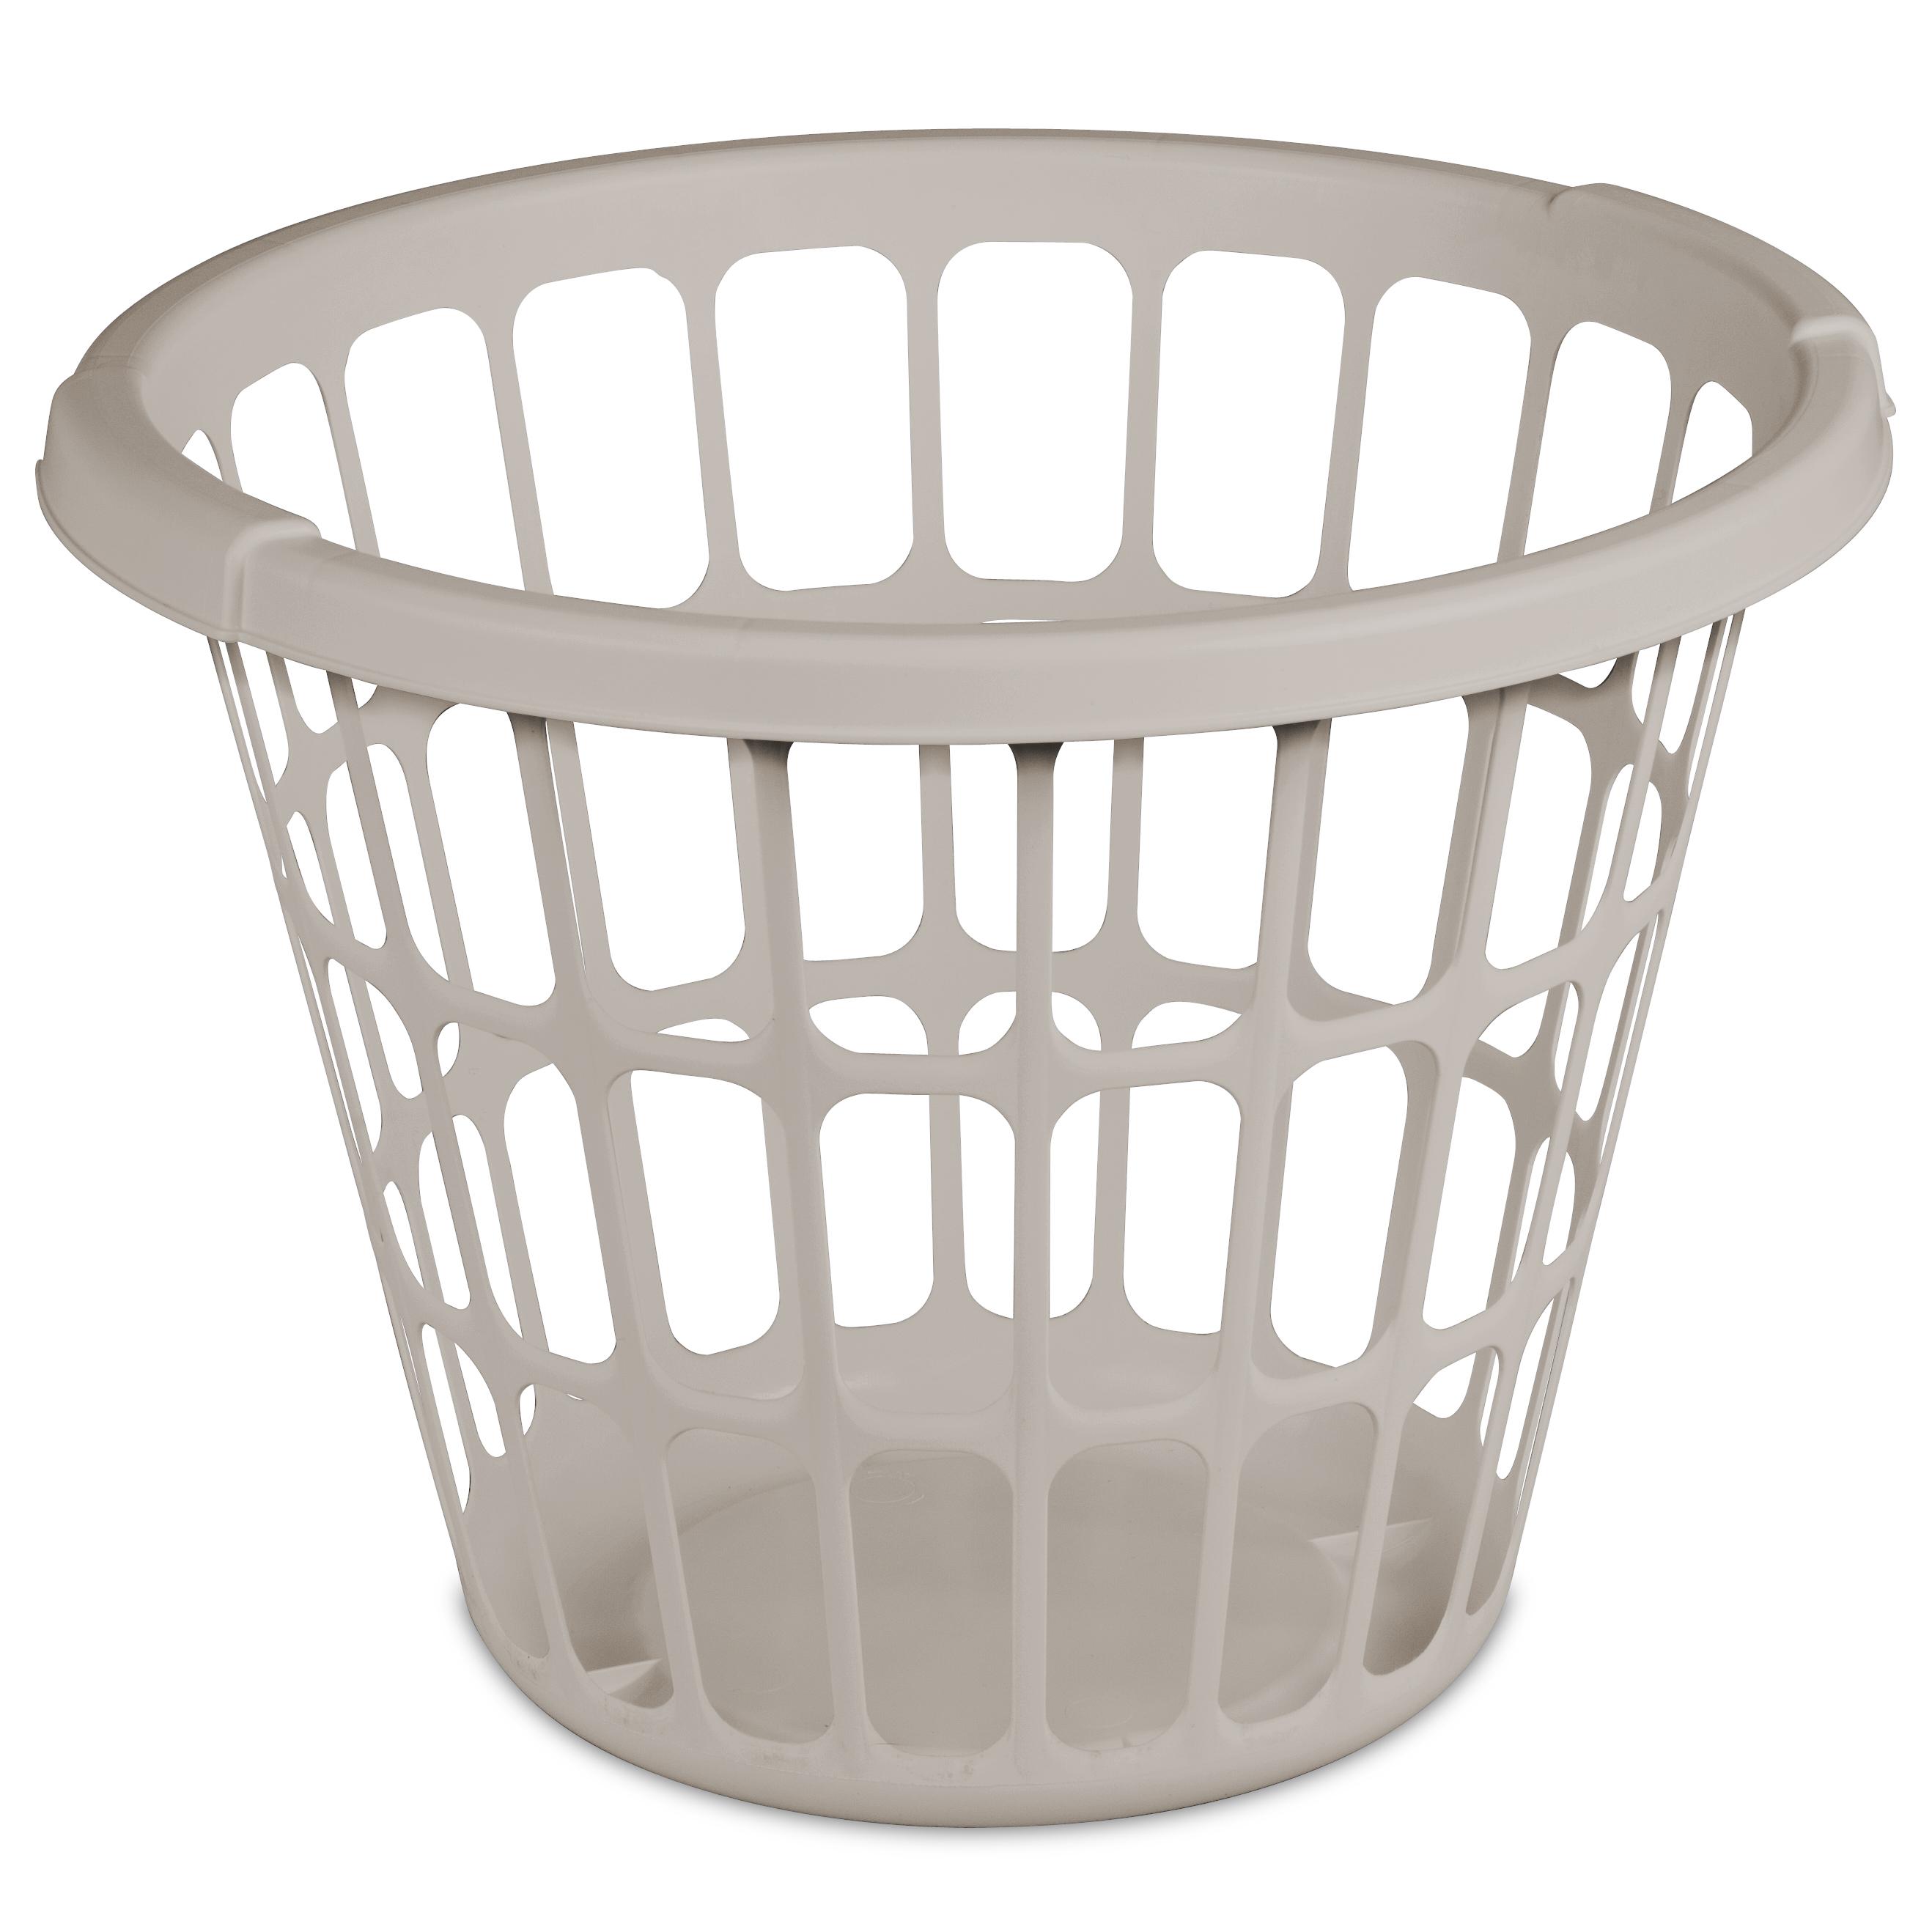 Sterilite Mainstays 1bu Laundry Basket-grey Pumice